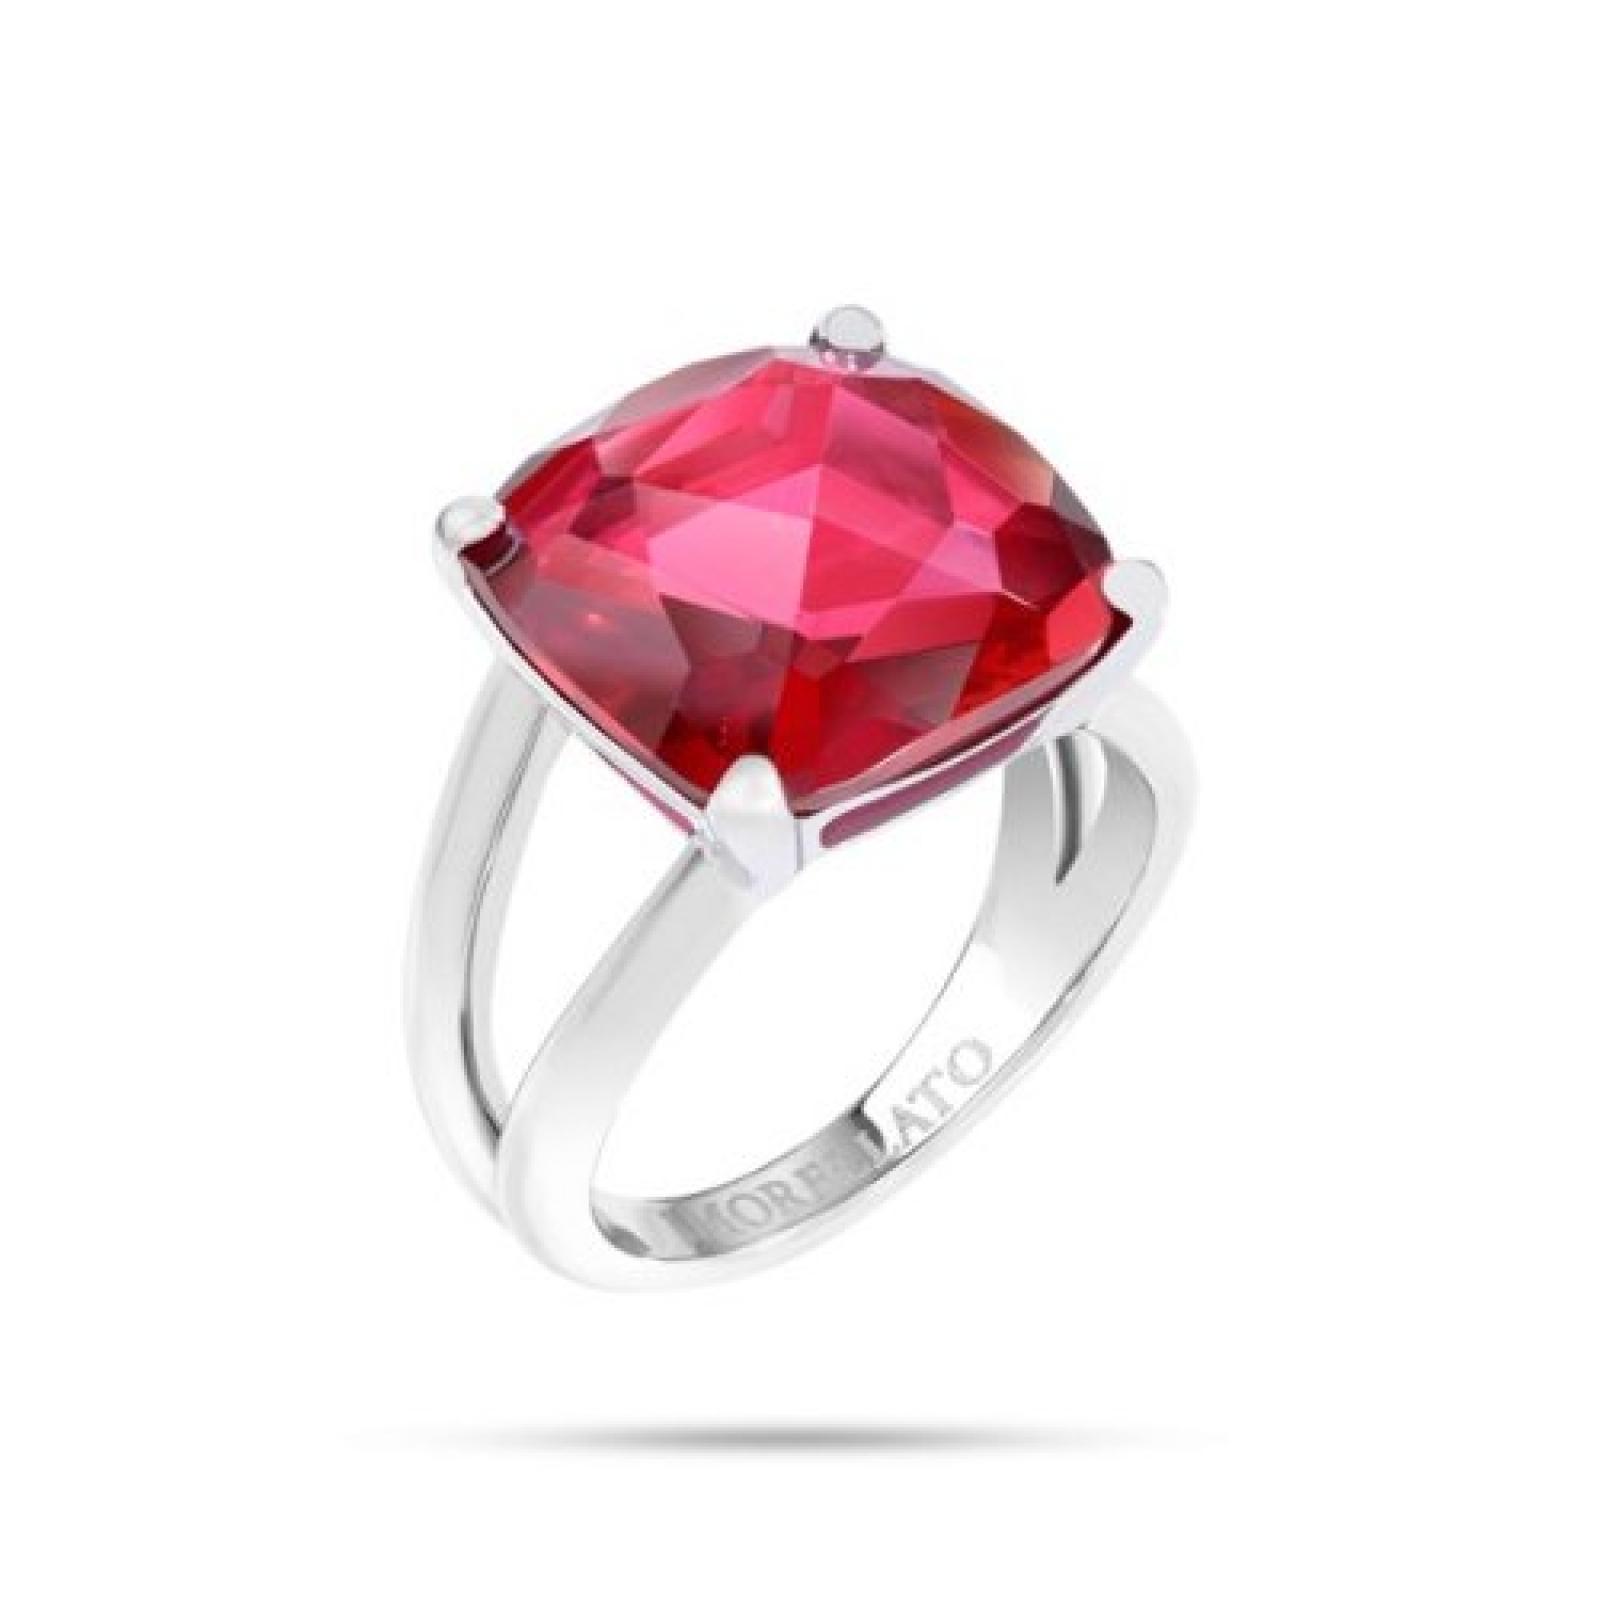 ORIGINAL MORELLATO Ring FIOREMIO Damen - SABK02018